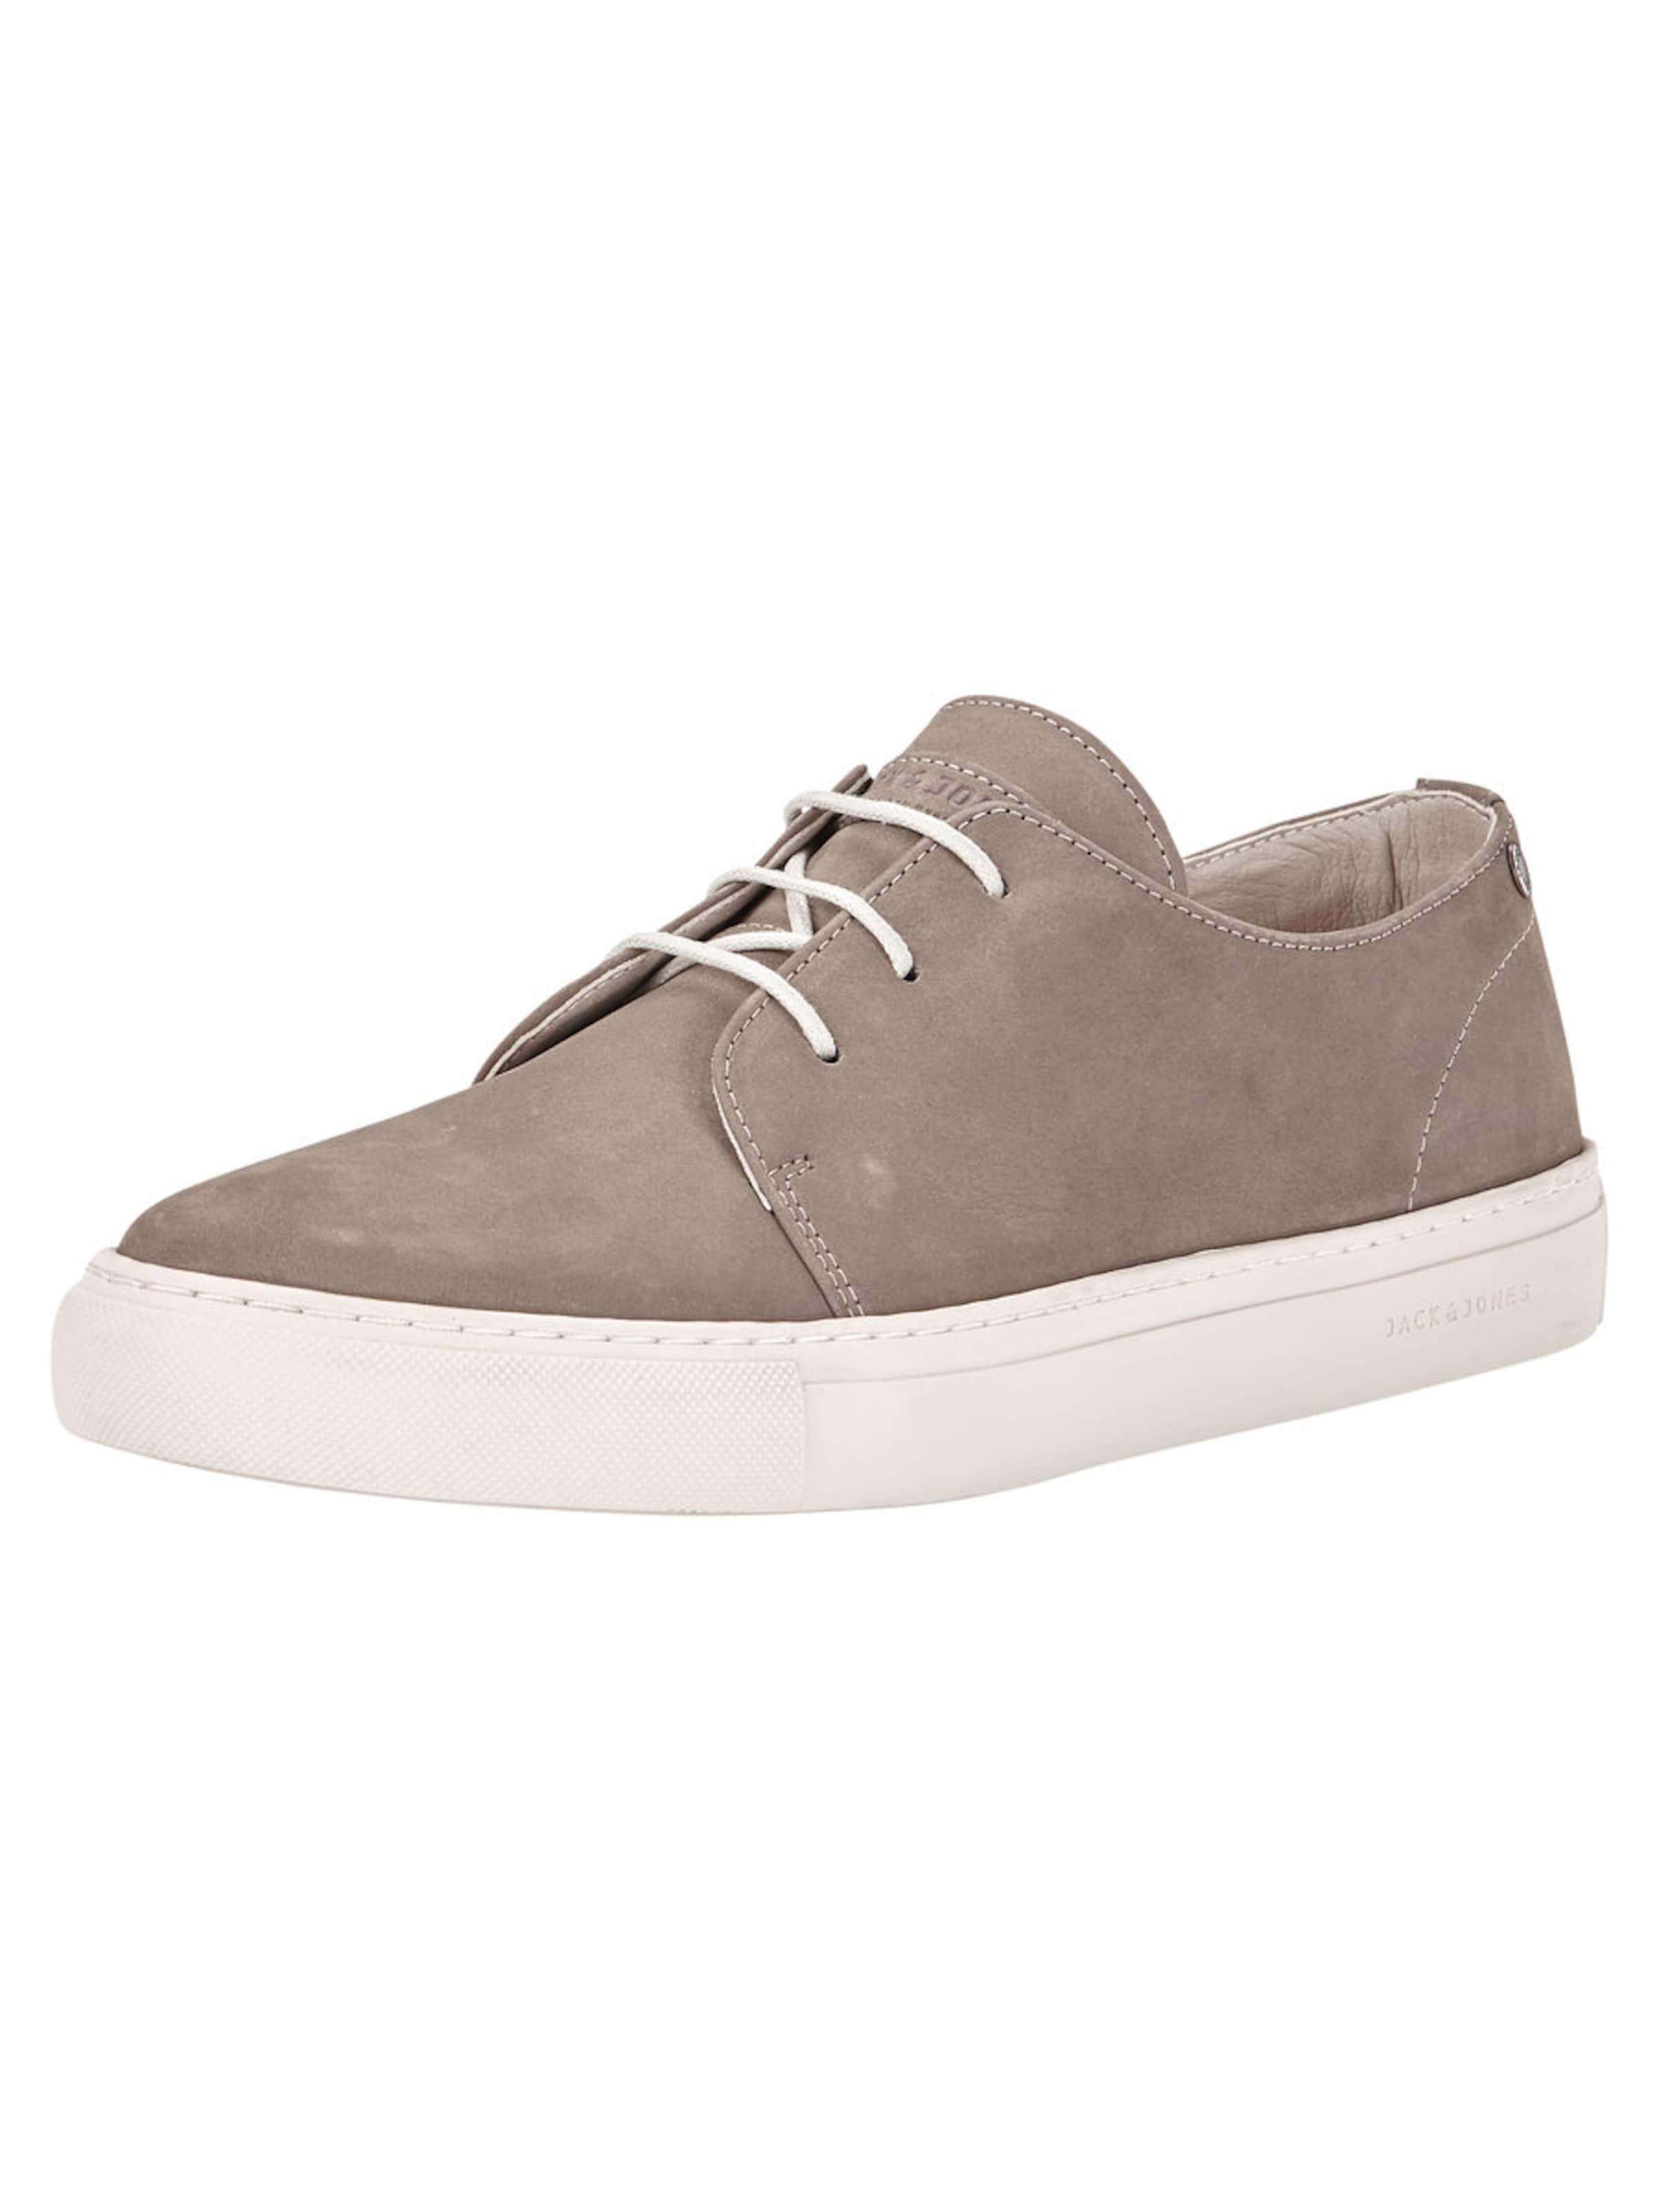 JACK & JONES Leder Sneaker Hohe Qualität